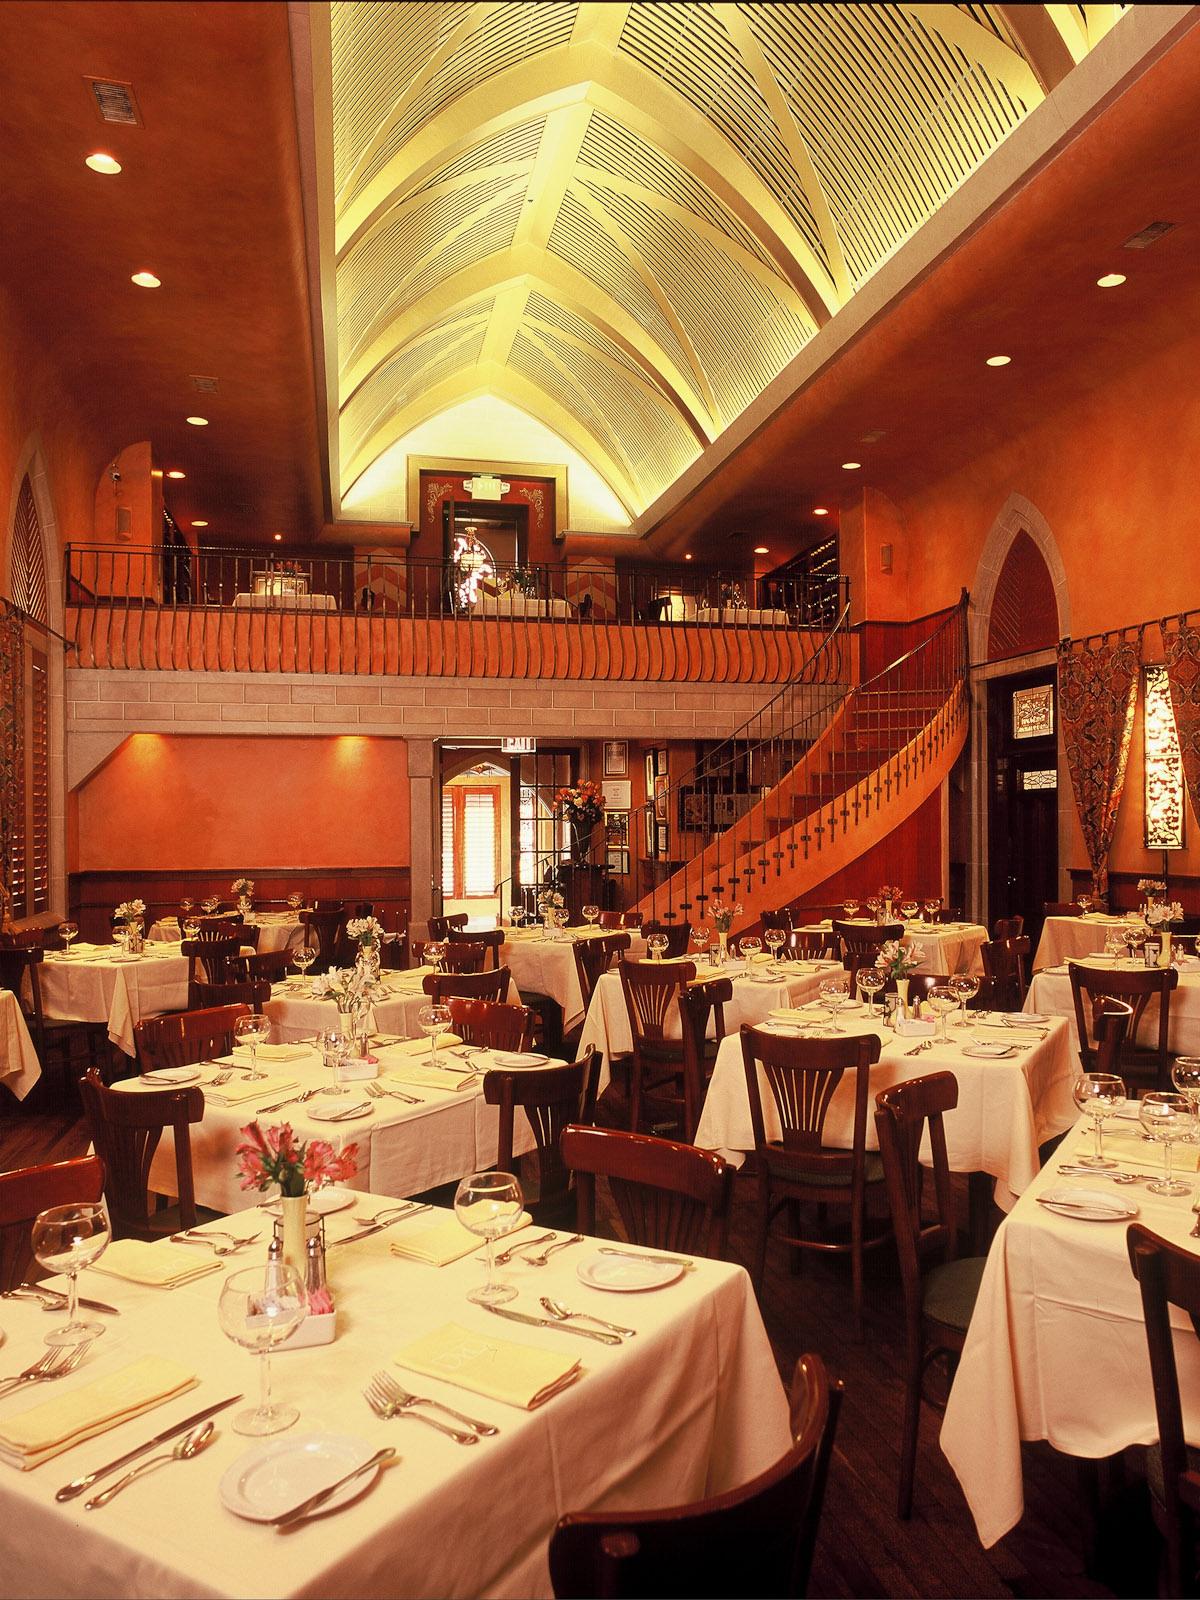 Places-Food-Mark's American Cuisine interior